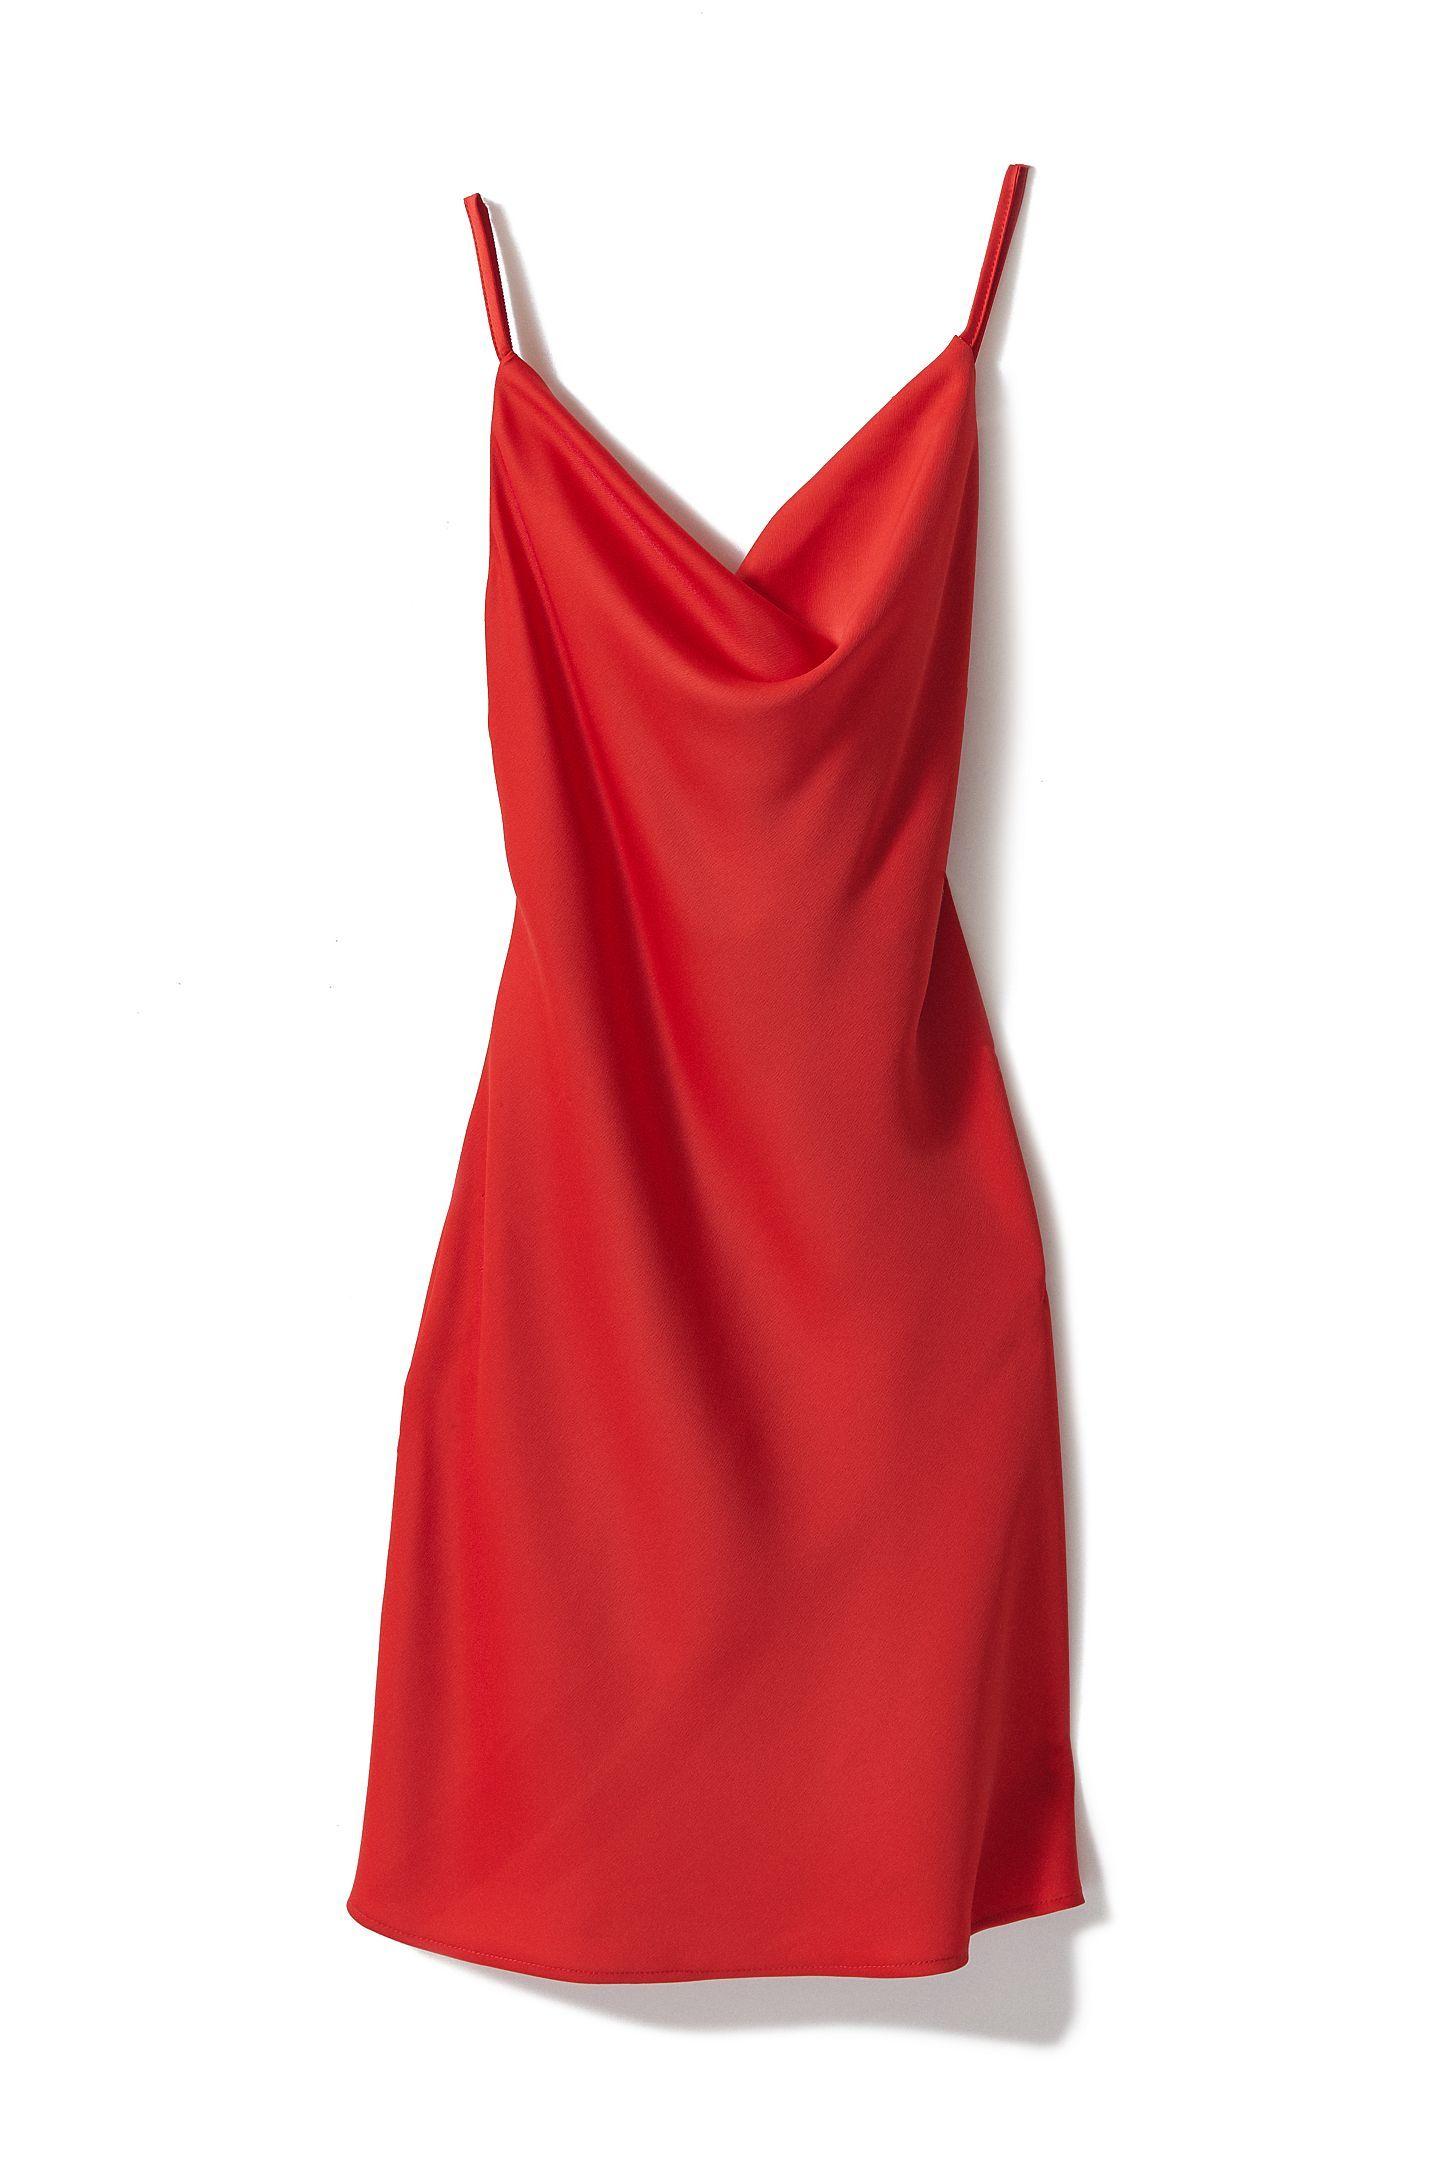 Uo Mallory Cowl Neck Slip Dress Red Slip Dress Slip Dress Mini Slip Dress